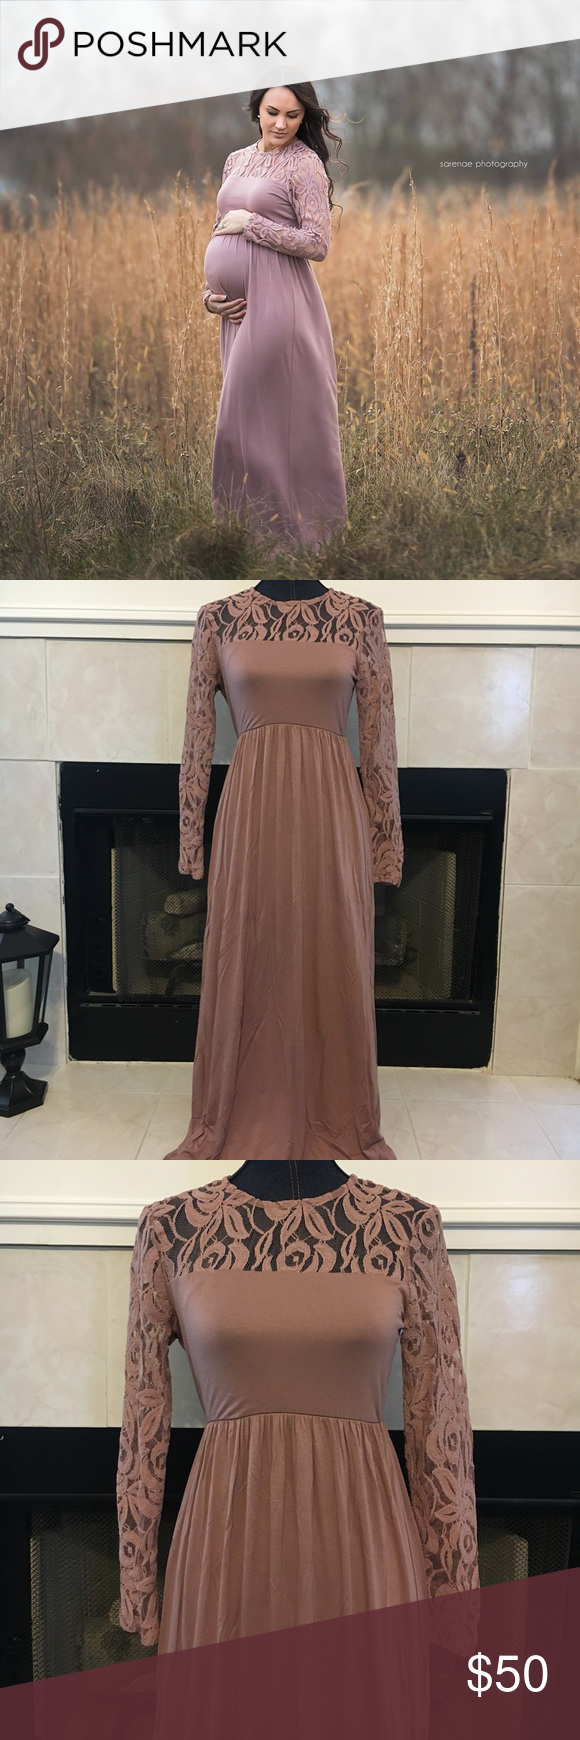 Small mauve lace long sleeve maternity maxi dress my posh closet